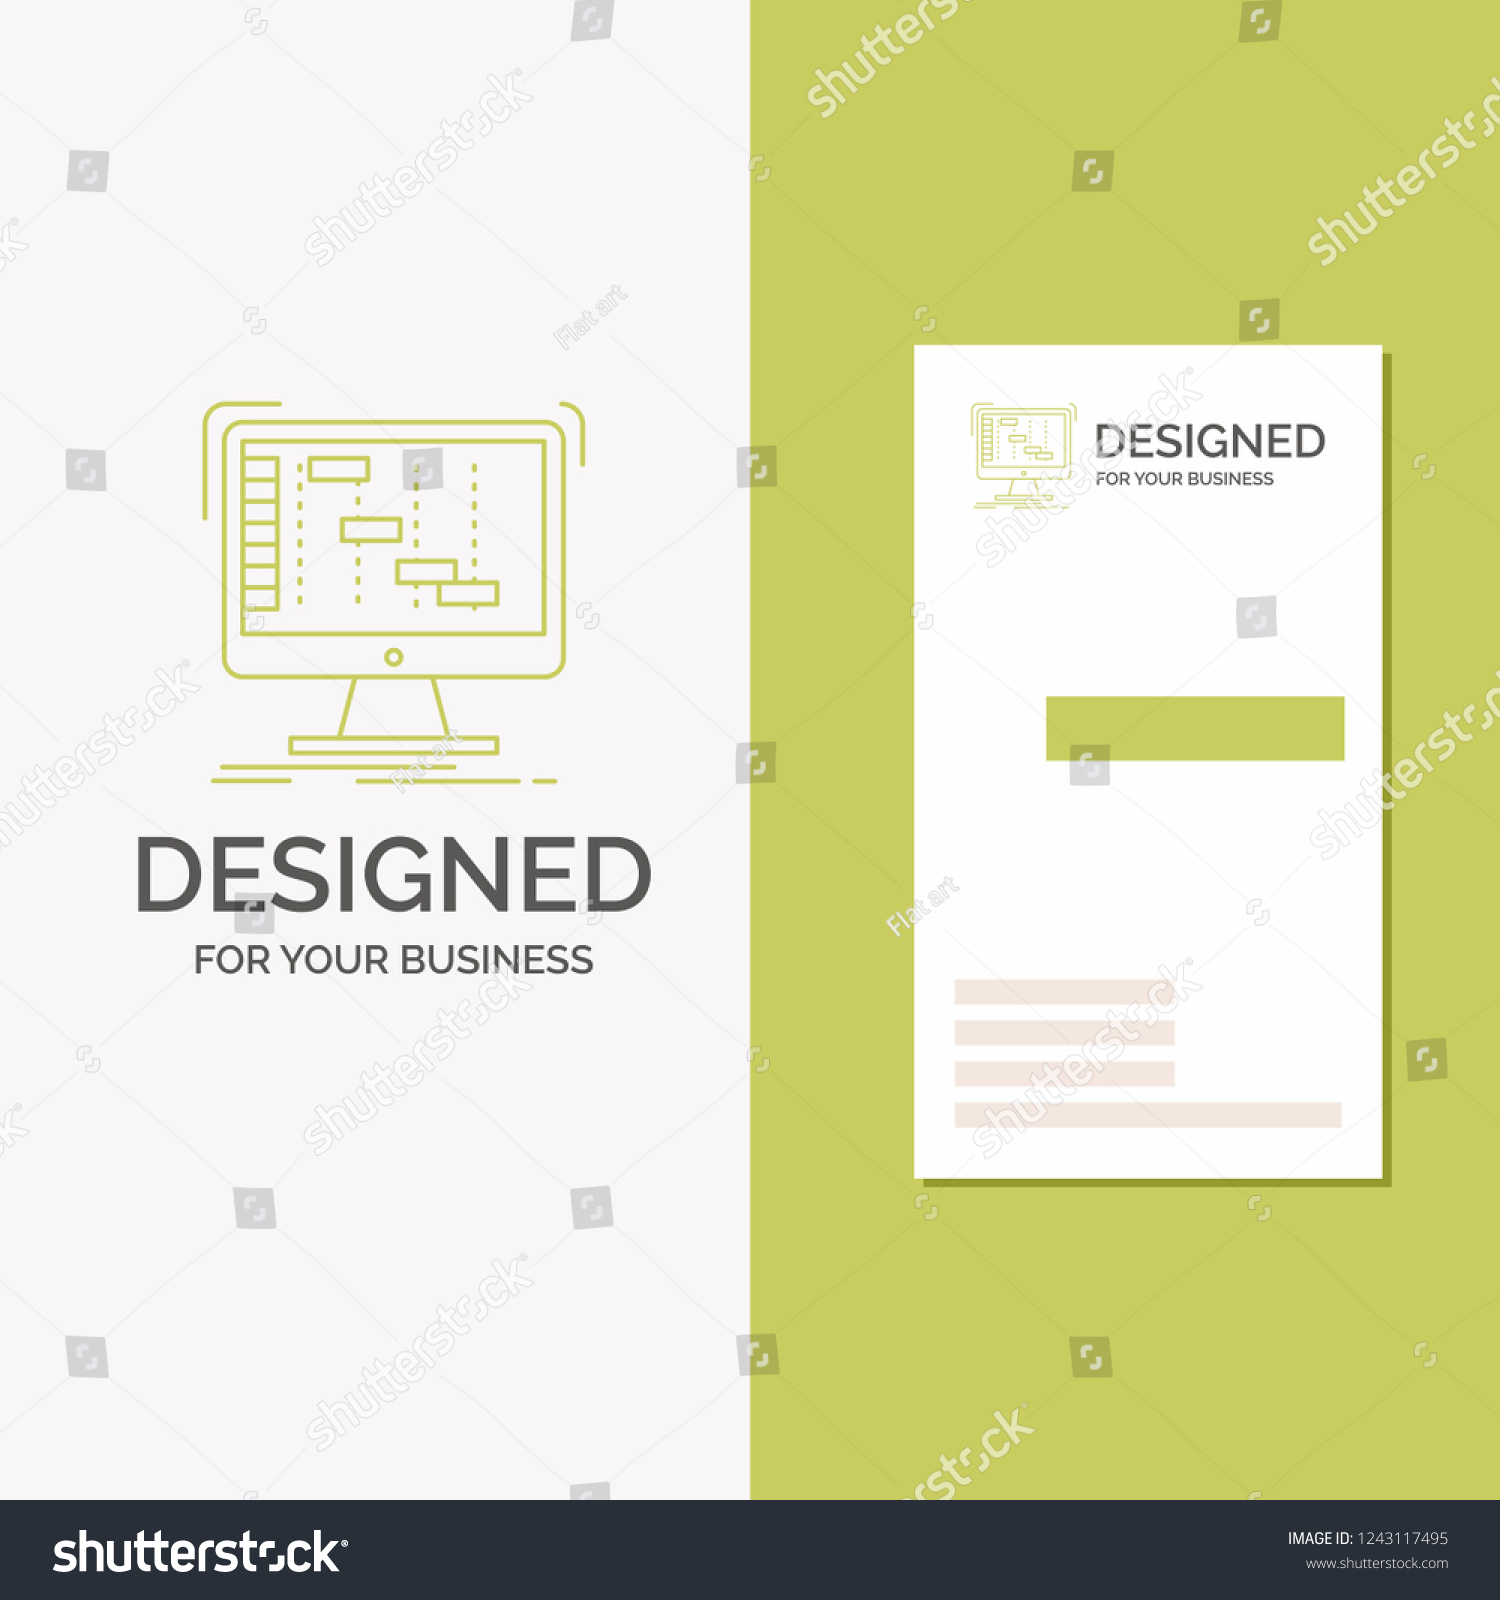 Business Logo Ableton Application Daw Digital Stock Vector (Royalty